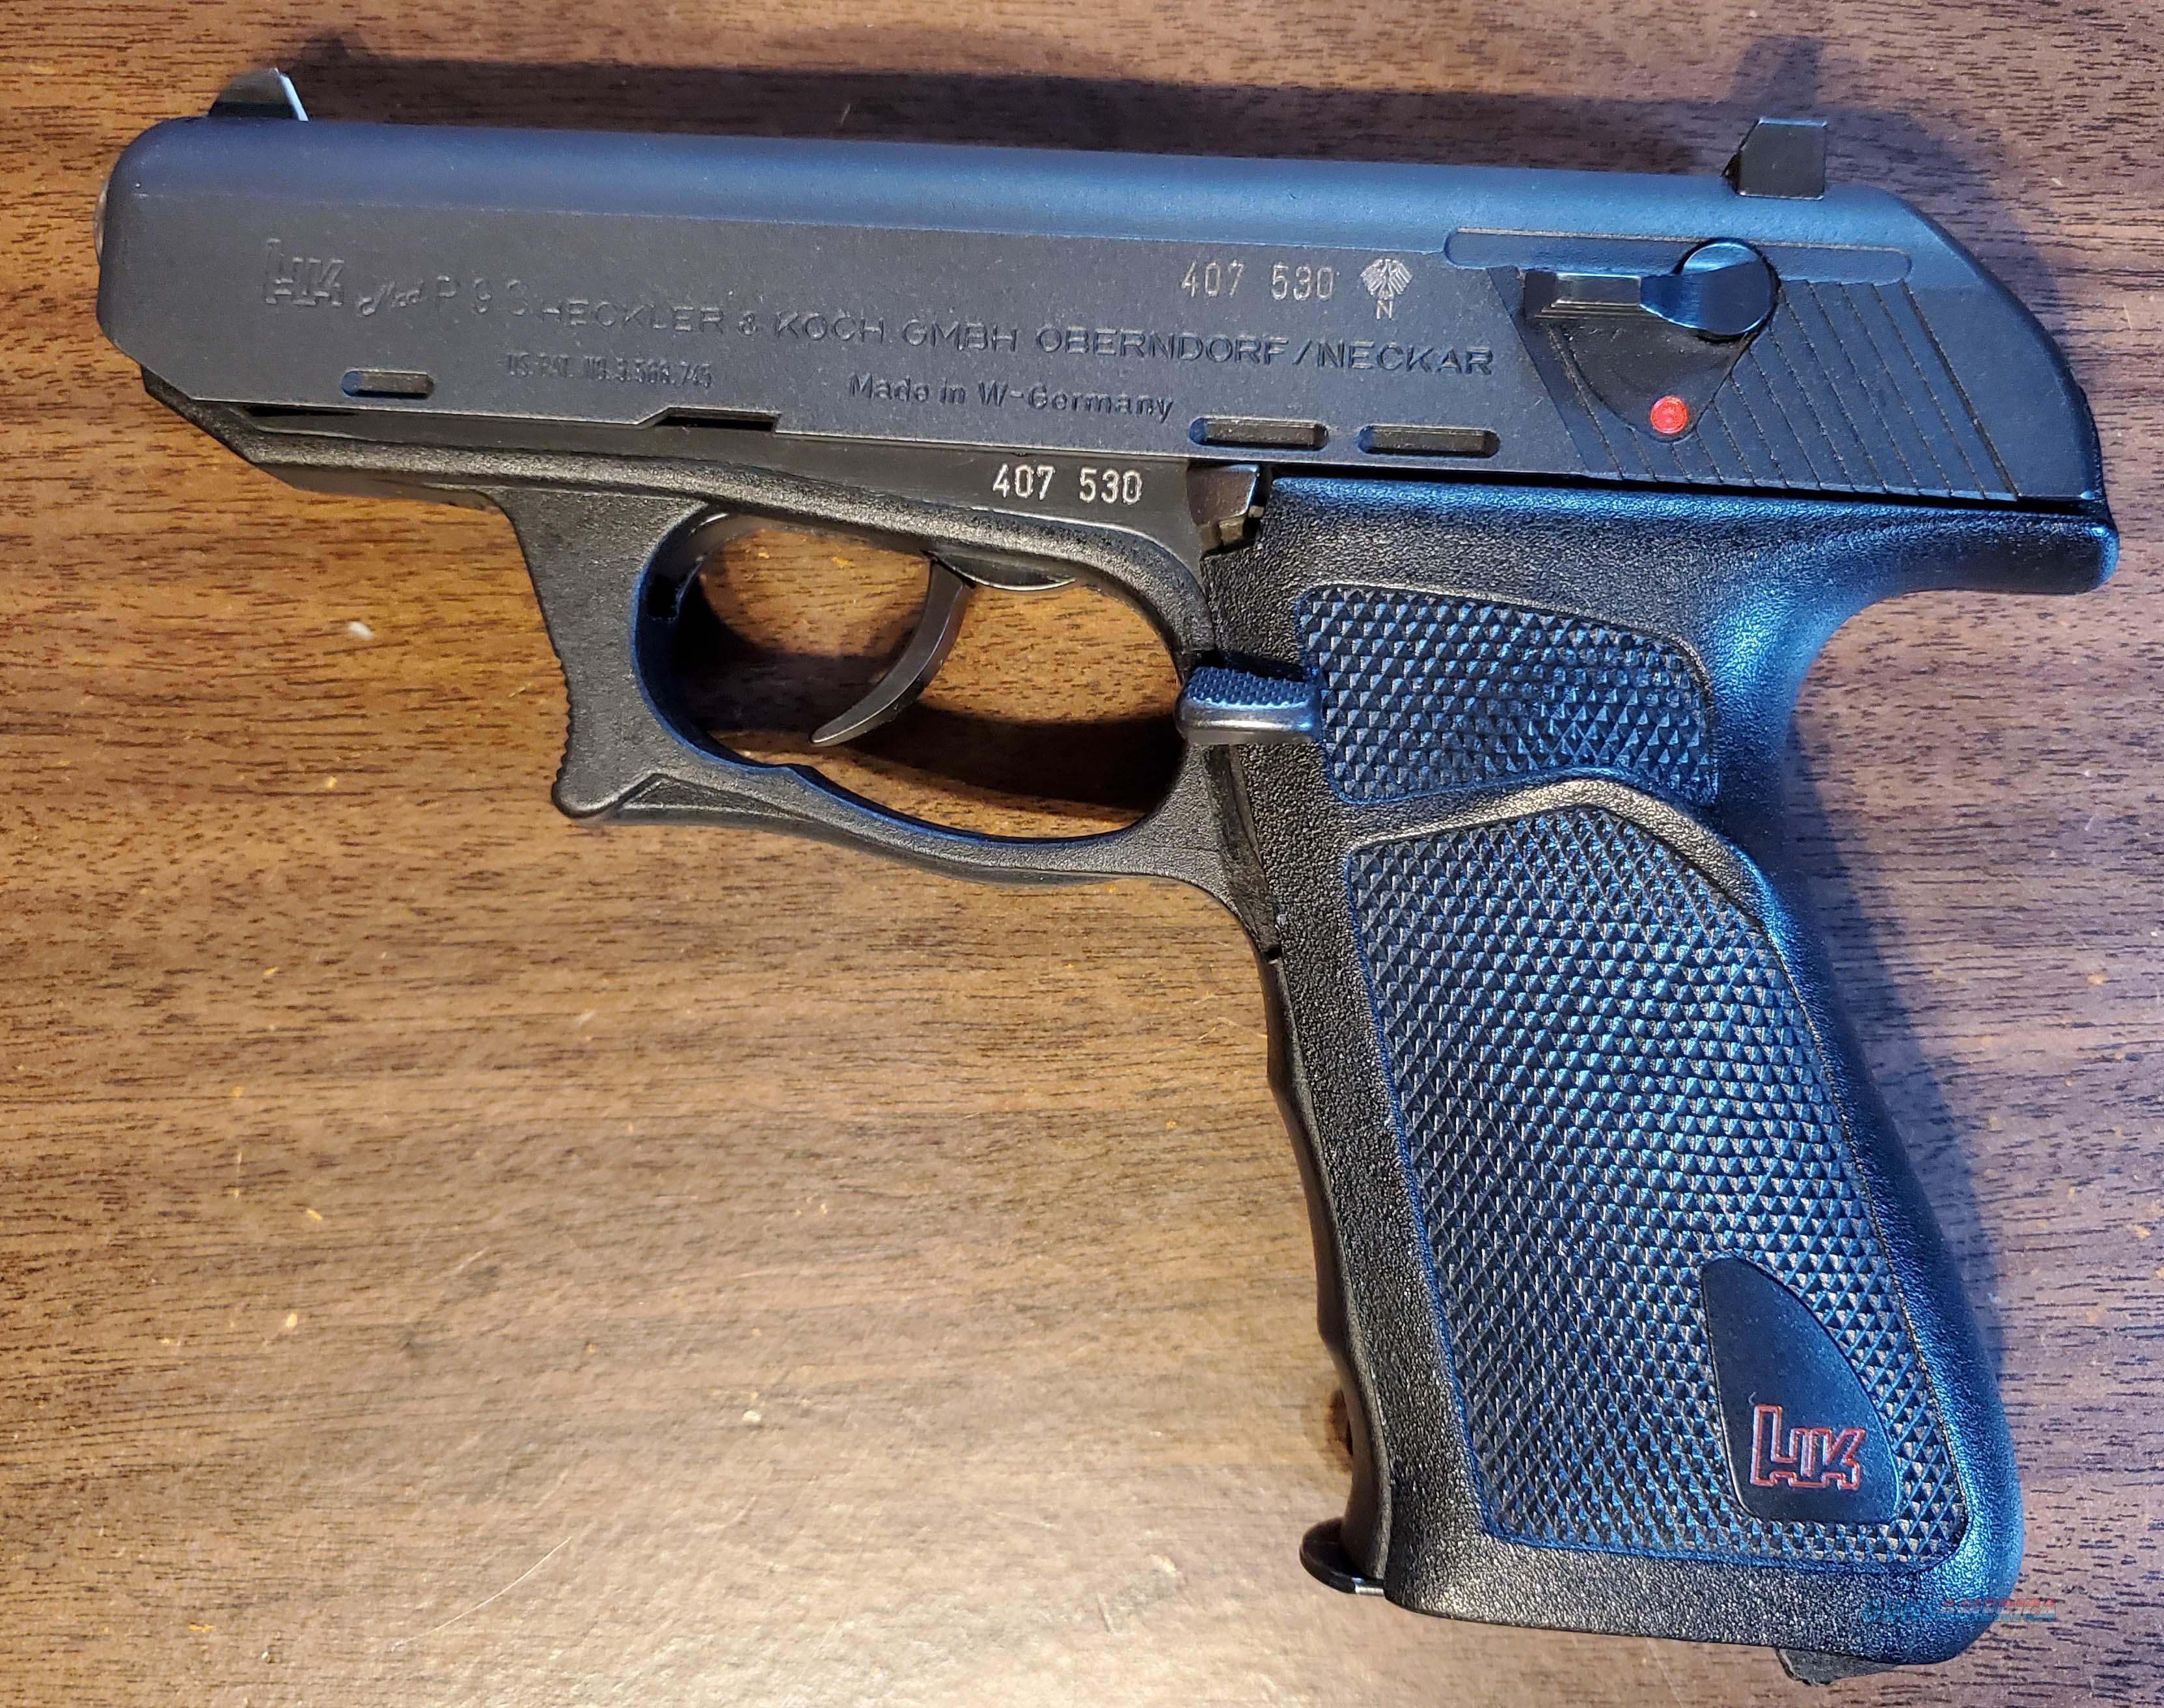 WTS HK P9S .45ACP  Guns > Pistols > Heckler & Koch Pistols > SteelFrame